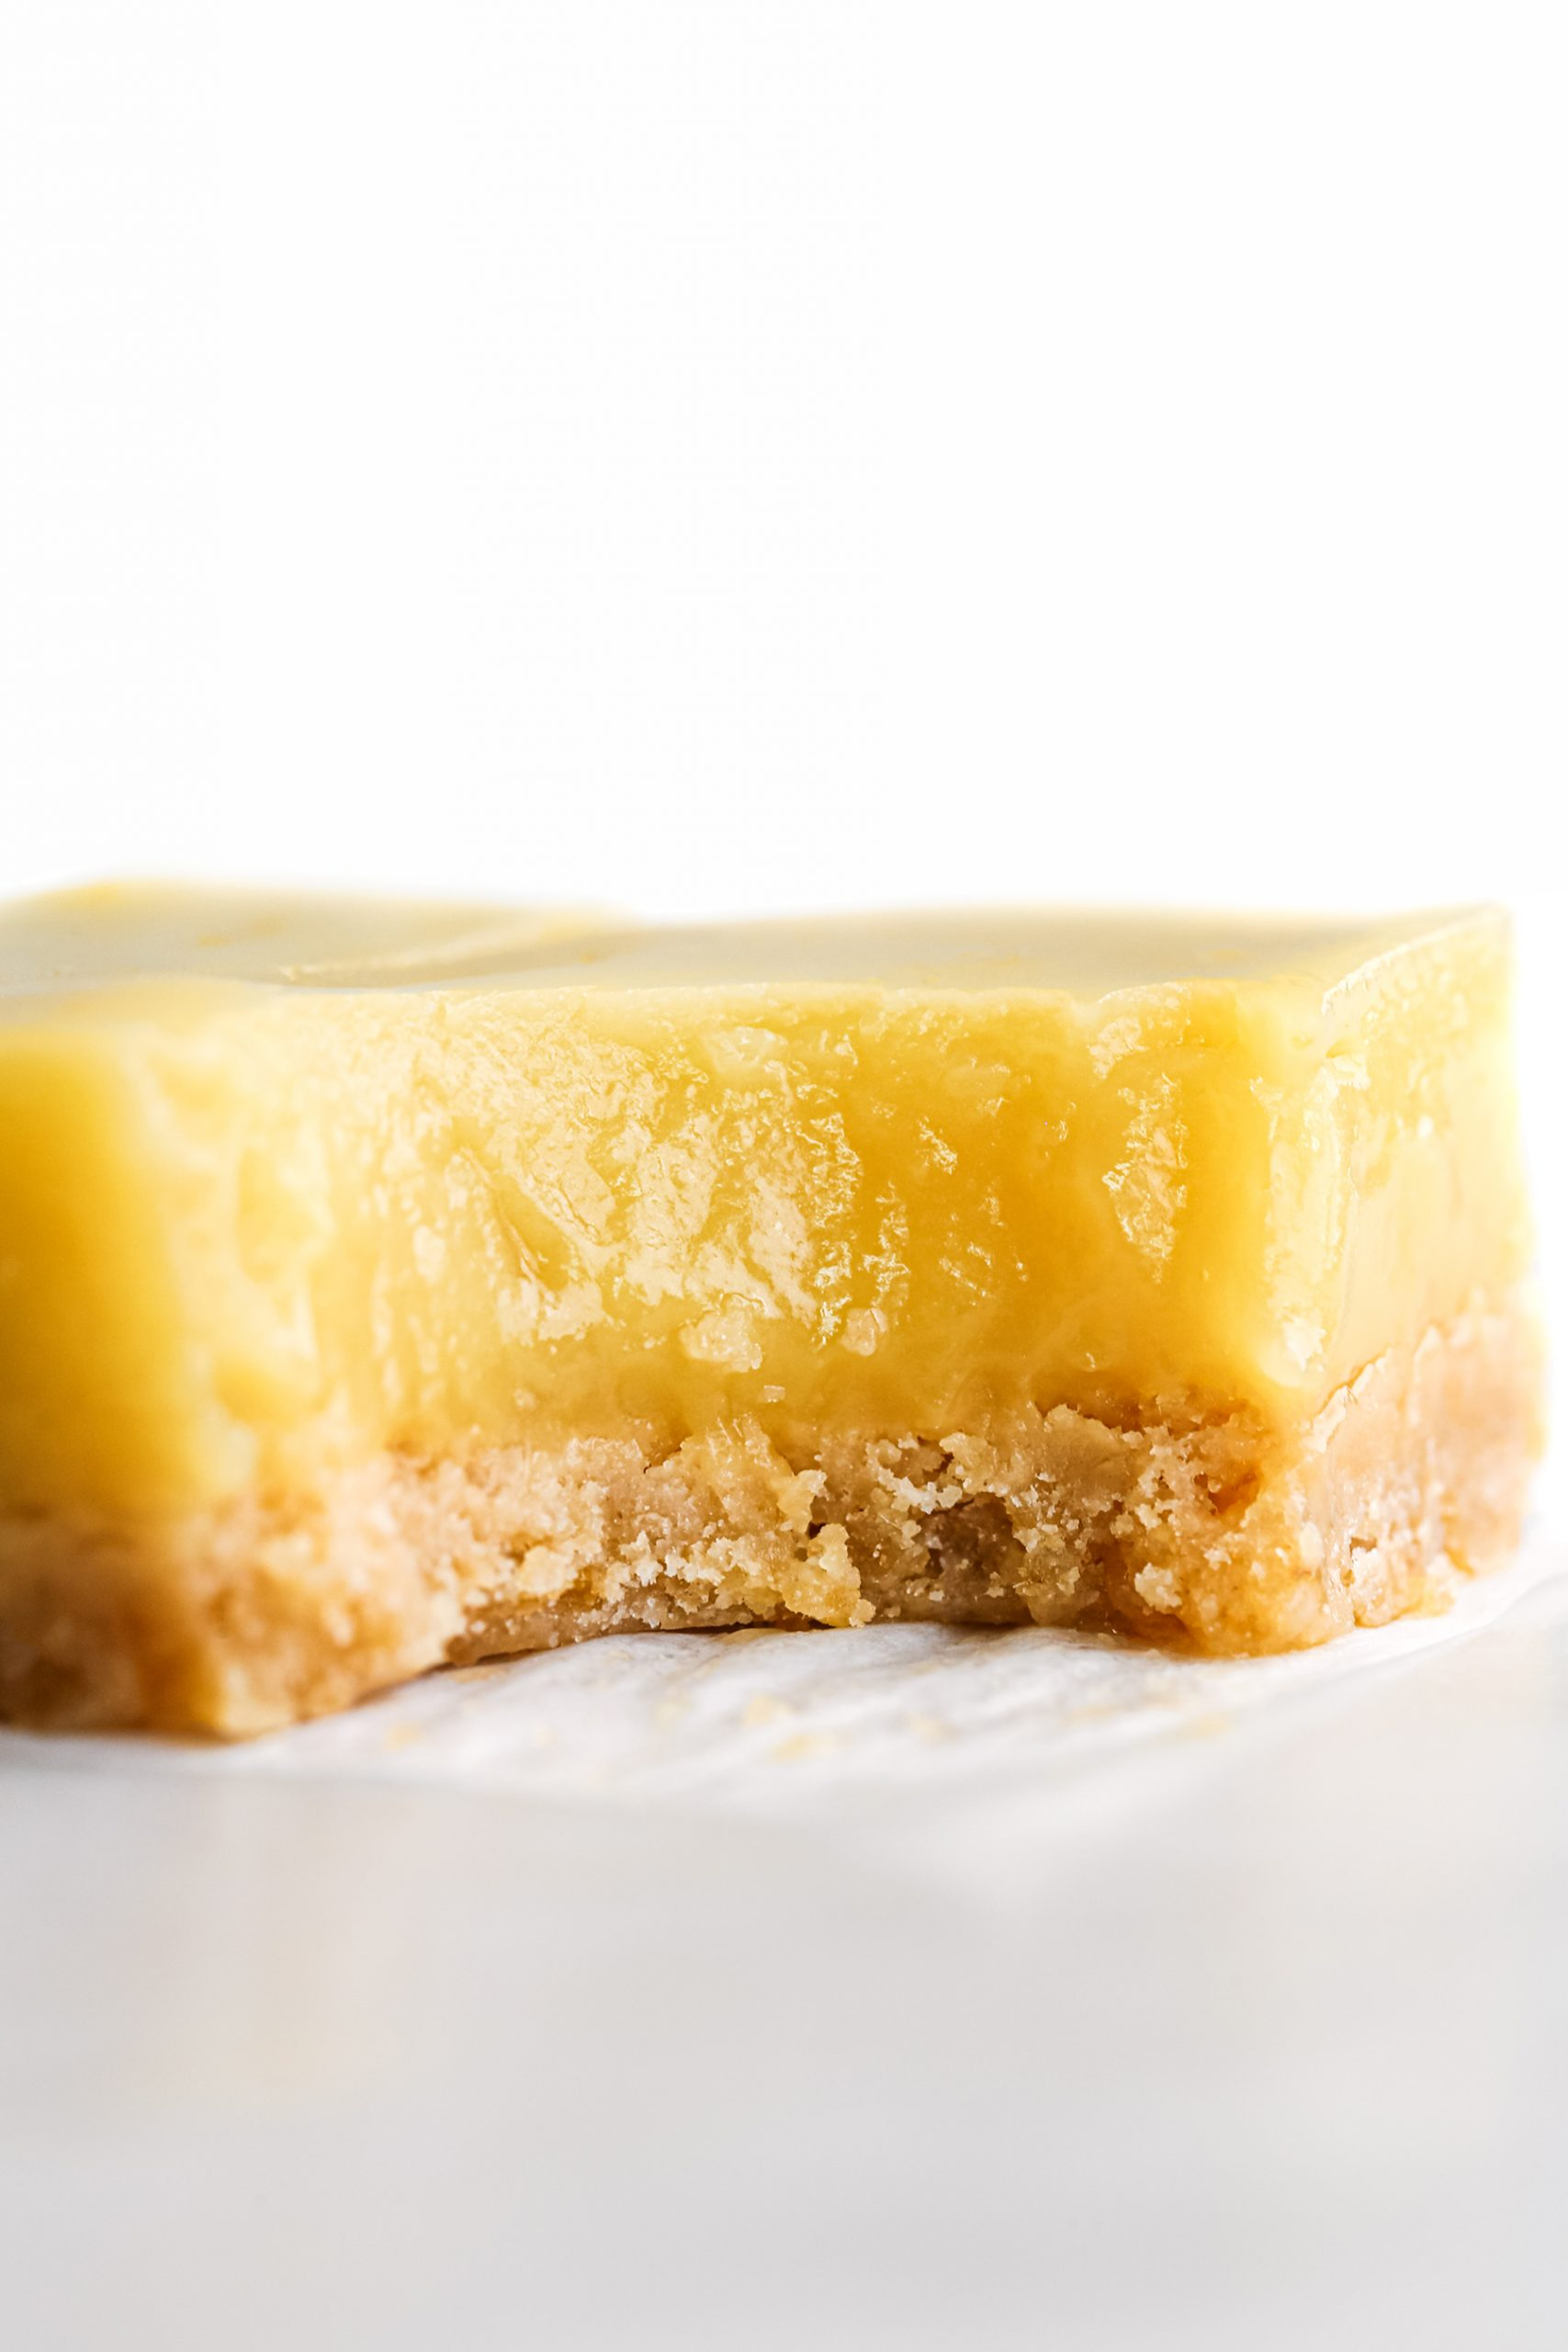 Naturally Sweetened Lemon Bars Bite